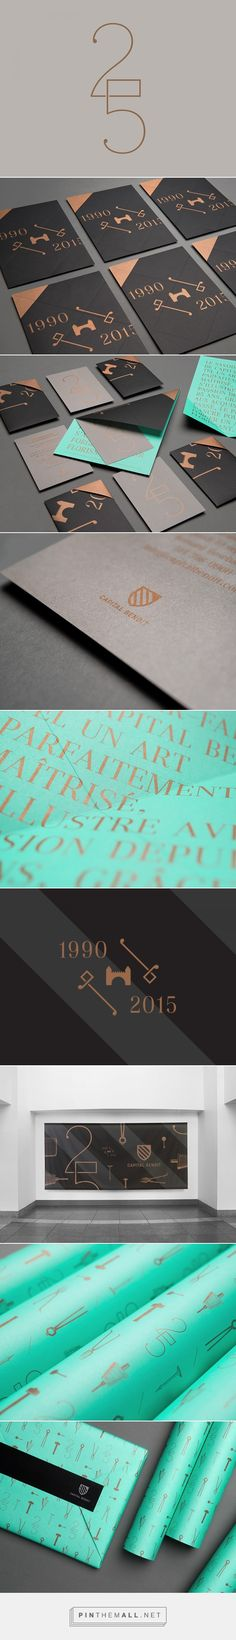 25th anniversary | Capital Benoit | lg2 | Fivestar Branding – Design and Branding Agency & Inspiration Gallery